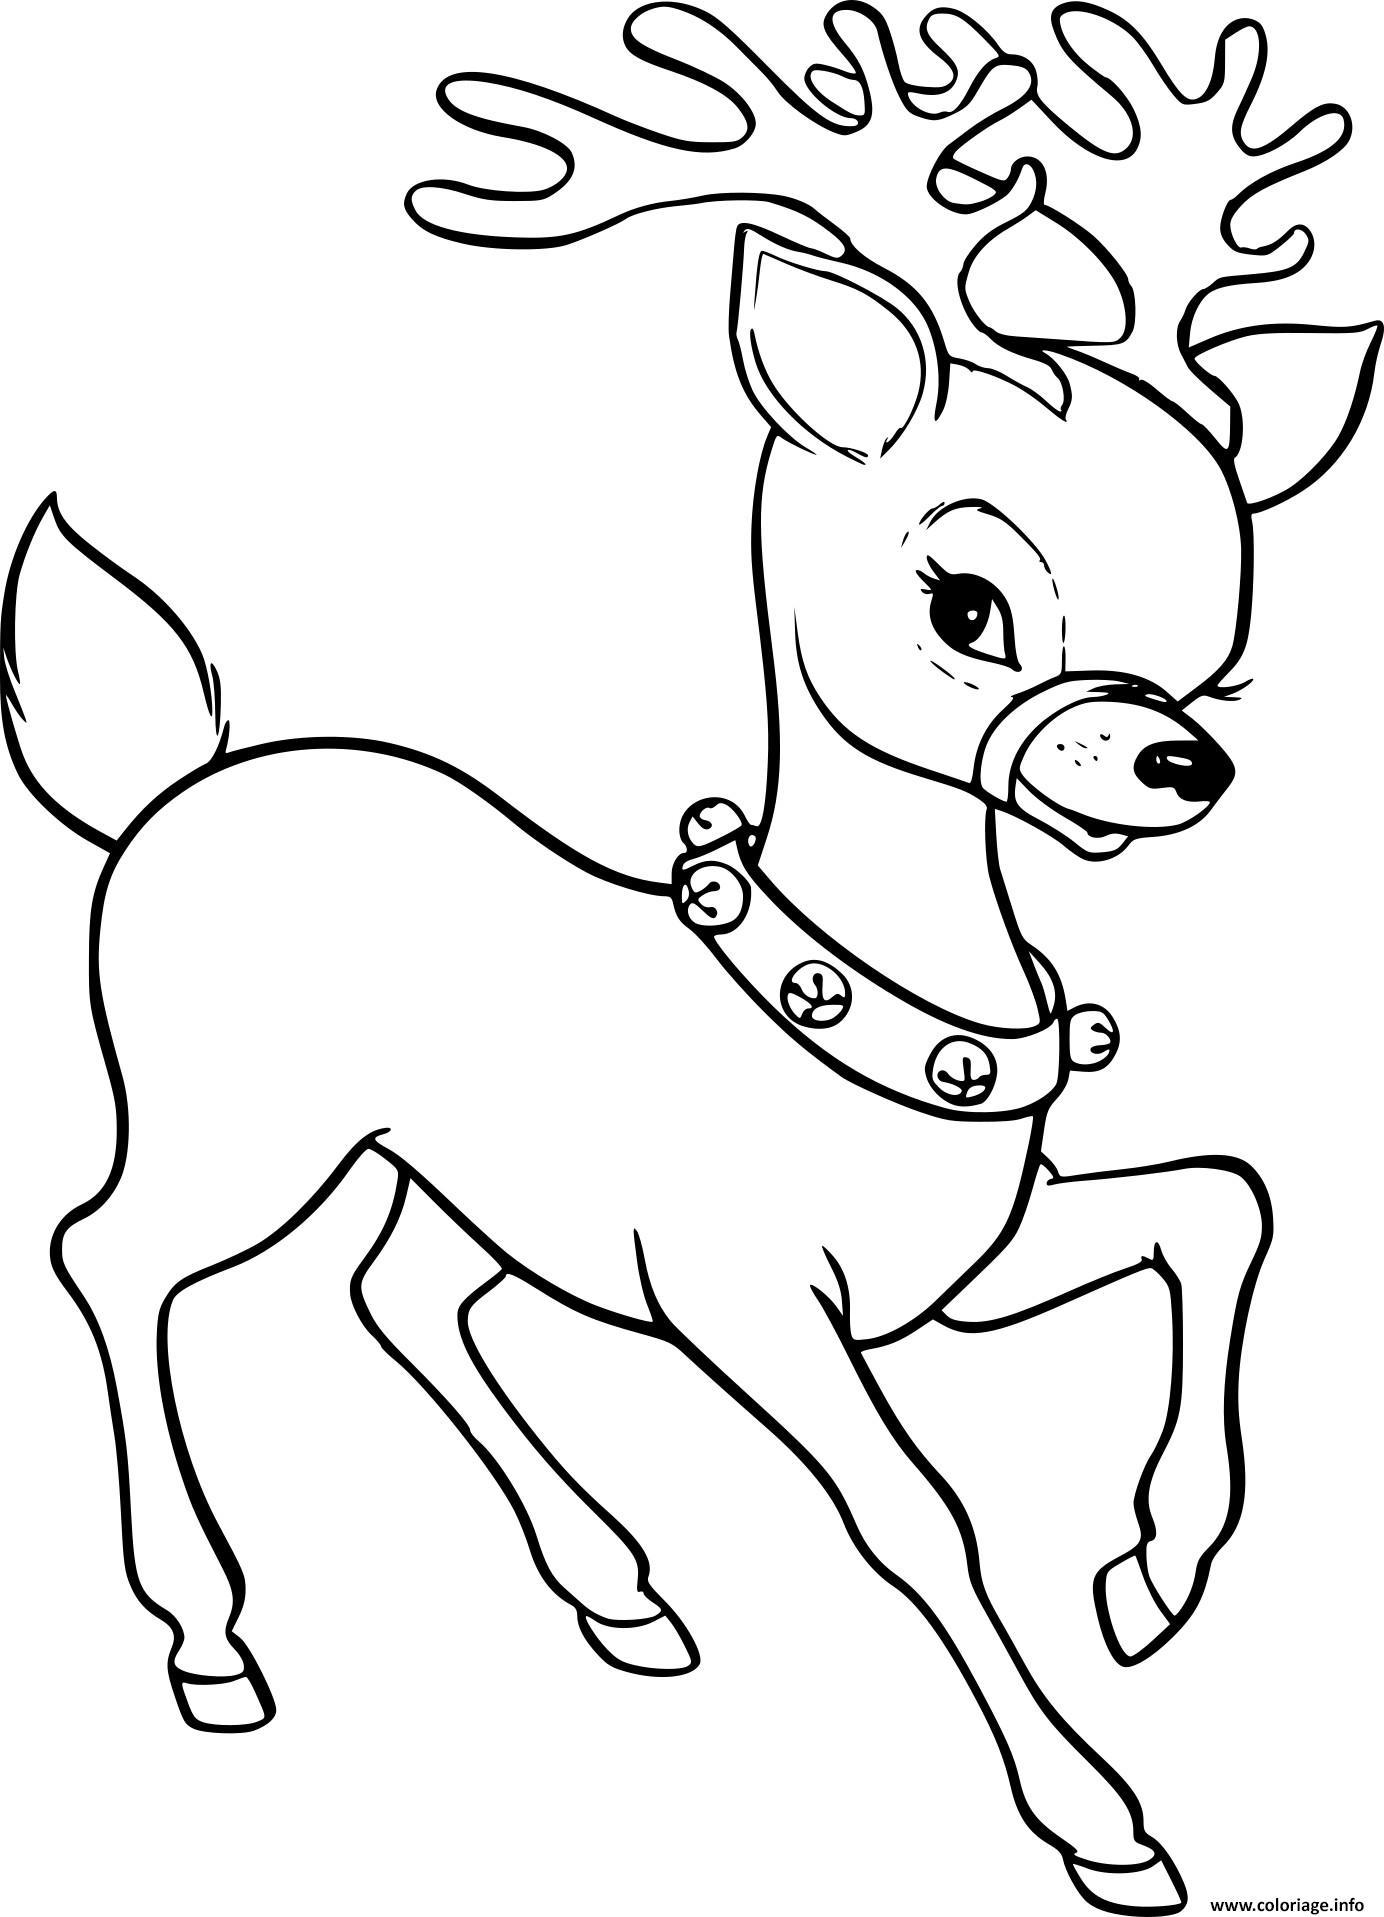 Coloriage Renne De Noel Femelle Dessin Renne De Noel A Imprimer